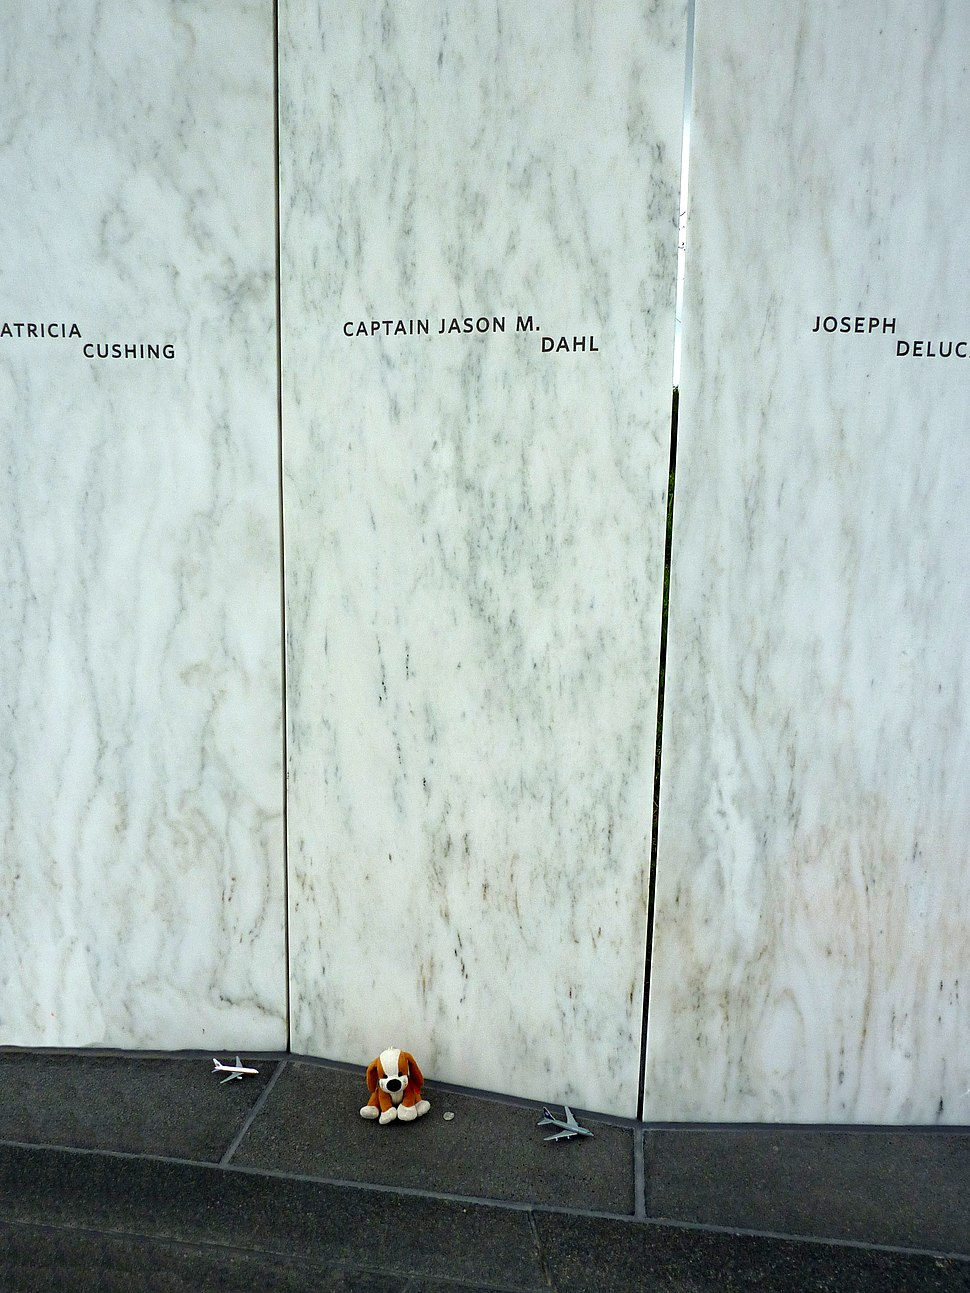 A tour of the Flight 93 National Memorial - 20